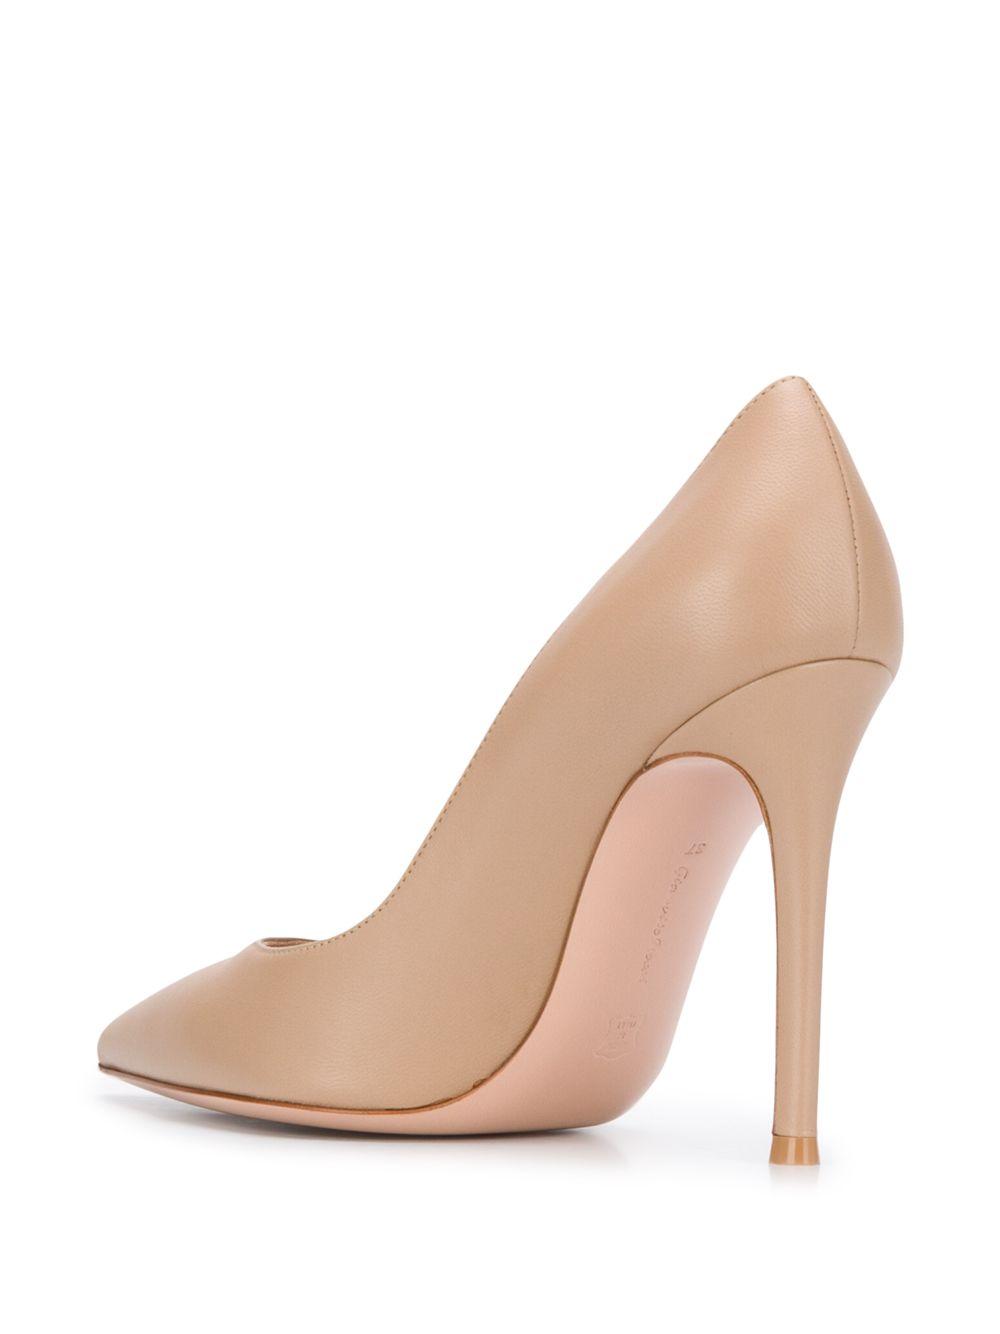 Bisque nude shoes GIANVITO ROSSI |  | G2847015RICNAPBISQ